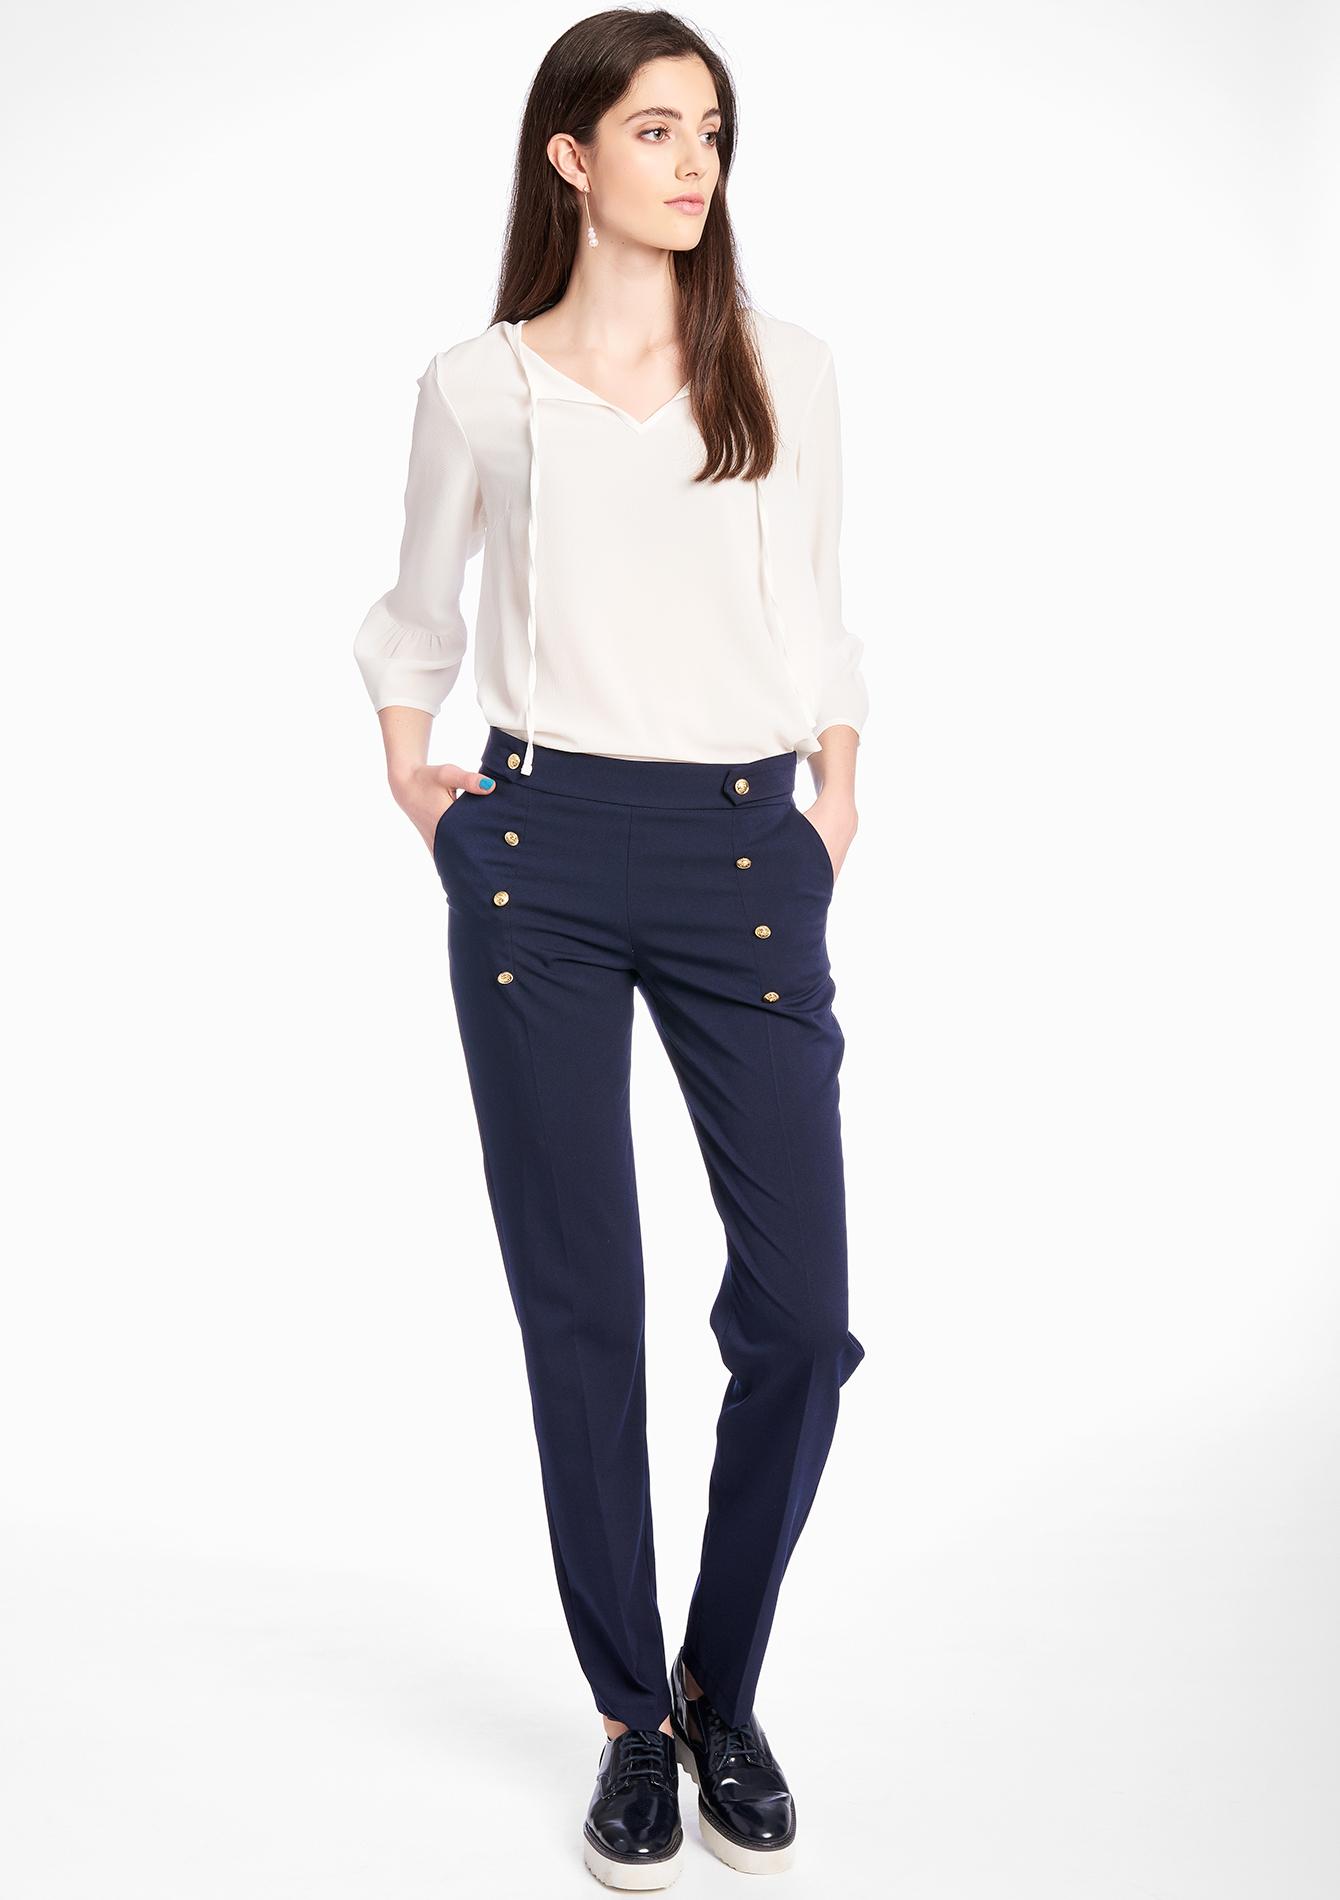 pantalon taille haute avec boutons dor s lolaliza. Black Bedroom Furniture Sets. Home Design Ideas